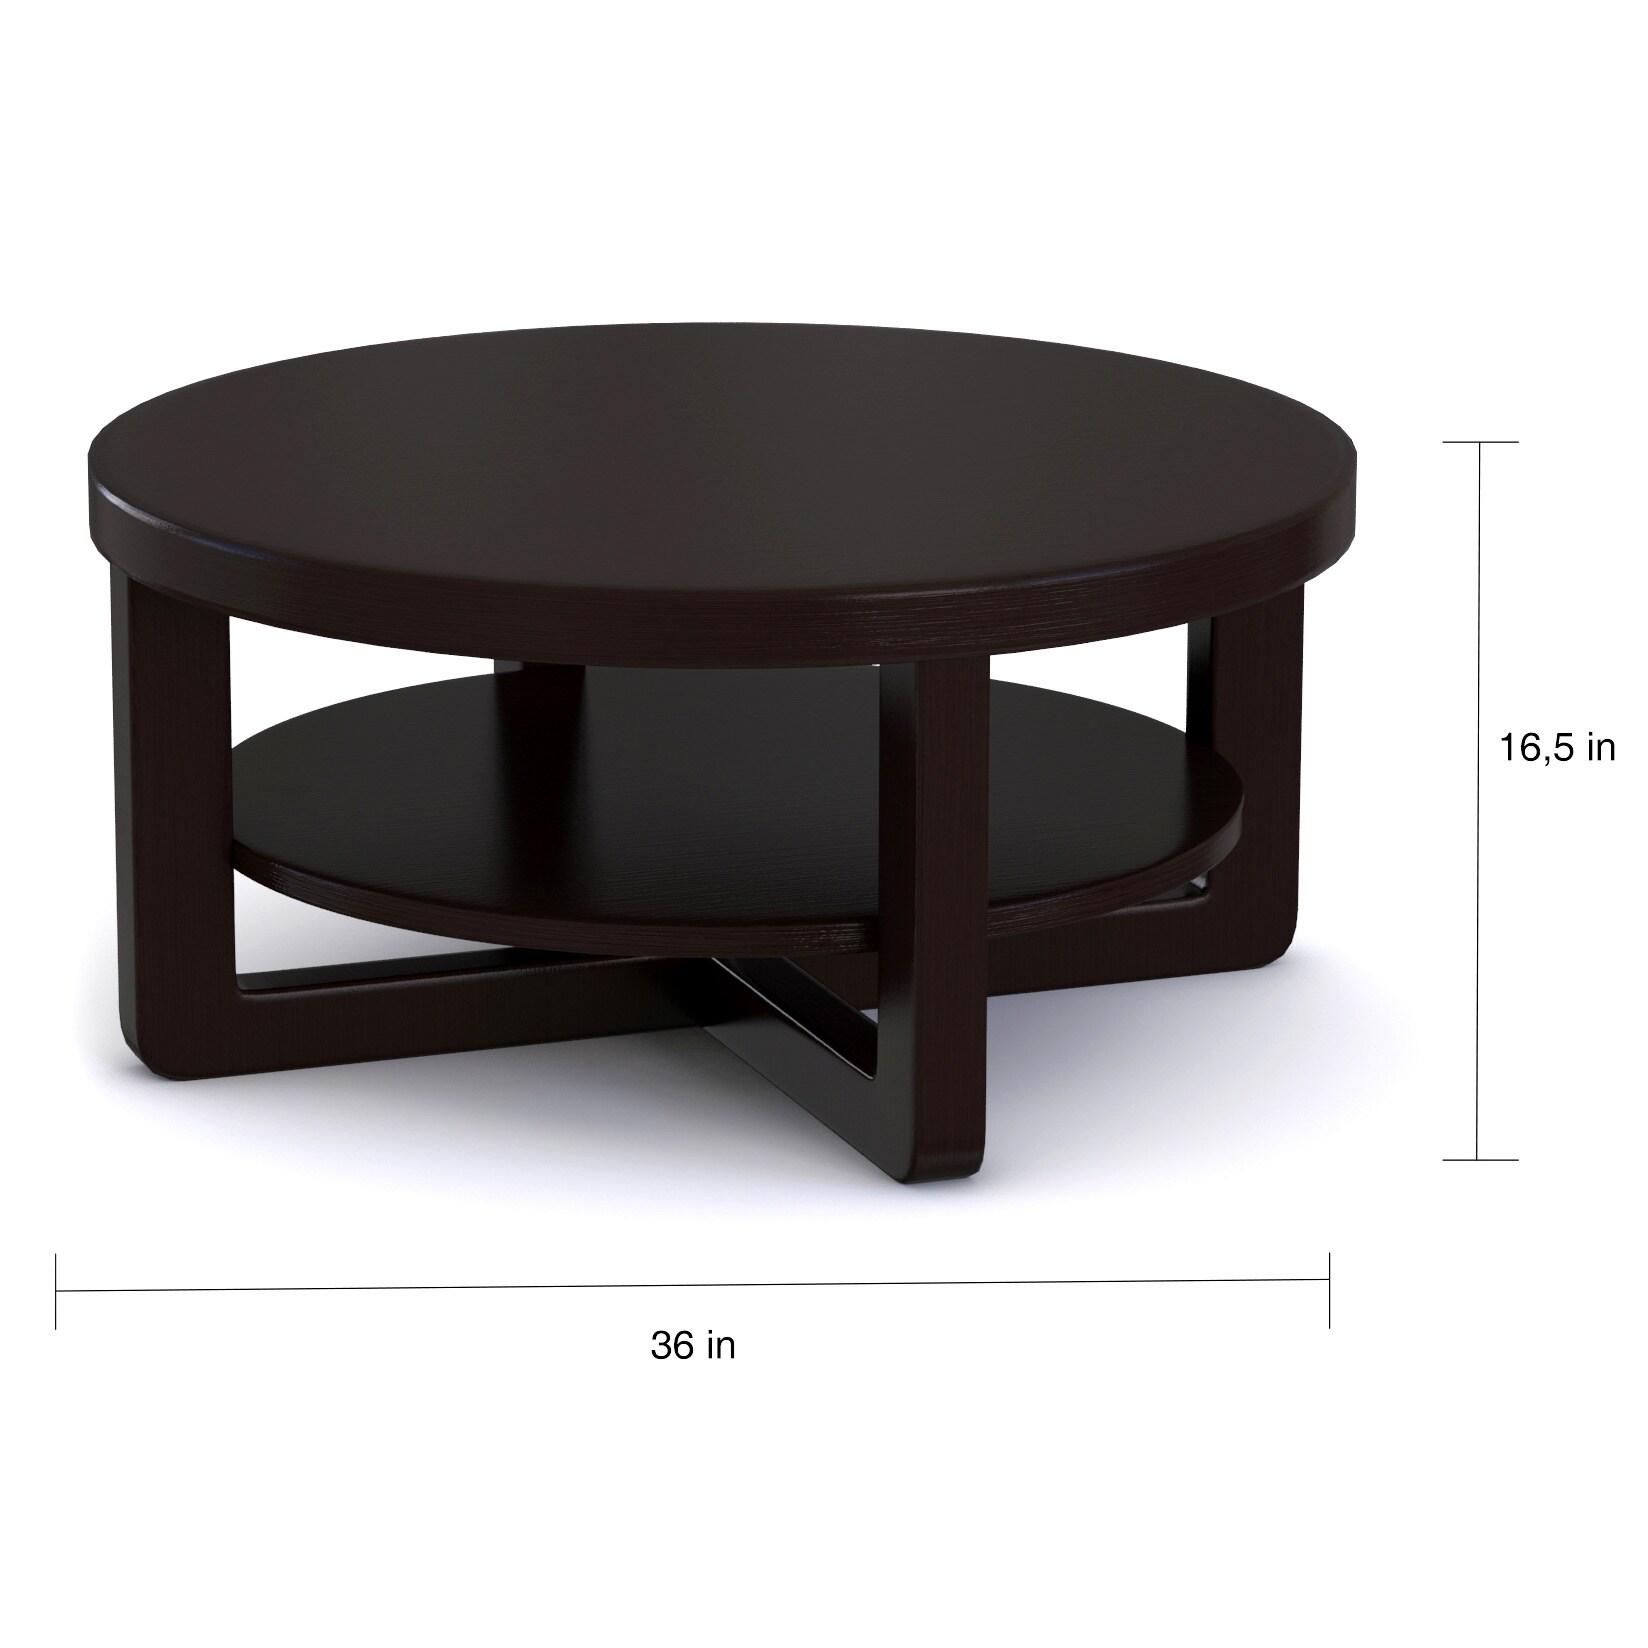 Porch & Den Bushwick Broadway Modern Cappuccino Round Coffee Table